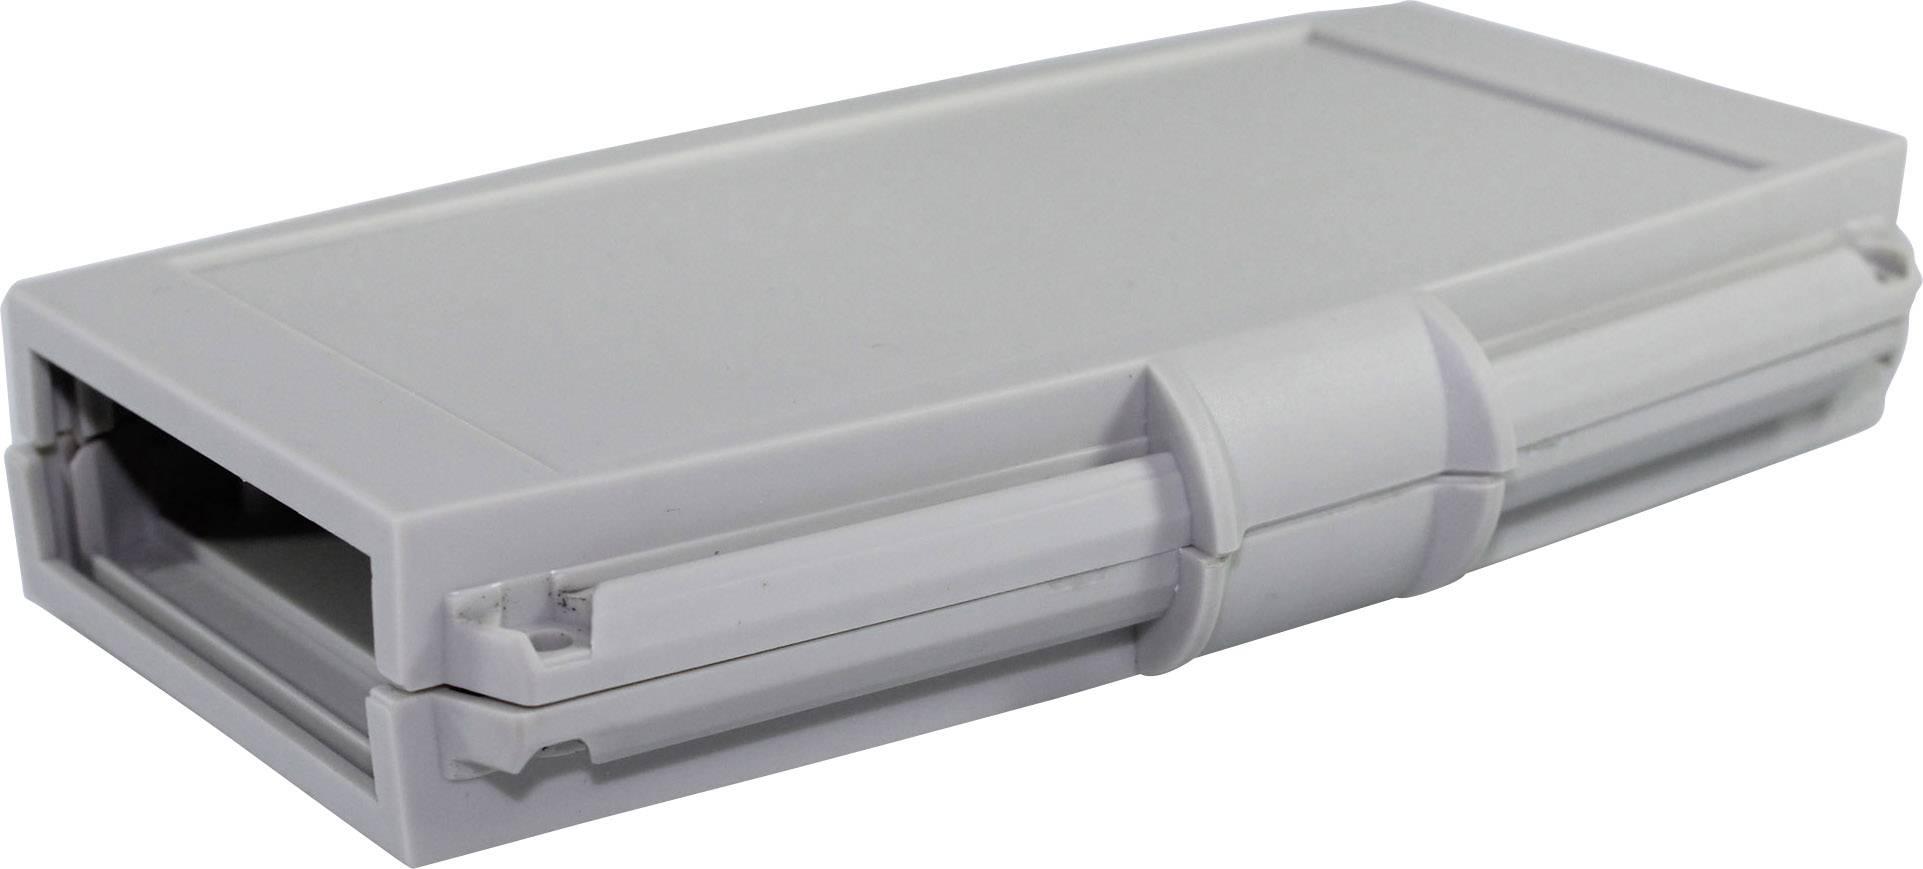 Plastová krabička Axxatronic CHH661NGY, 145 x 95 x 25 mm, ABS, světle šedá, 1 ks